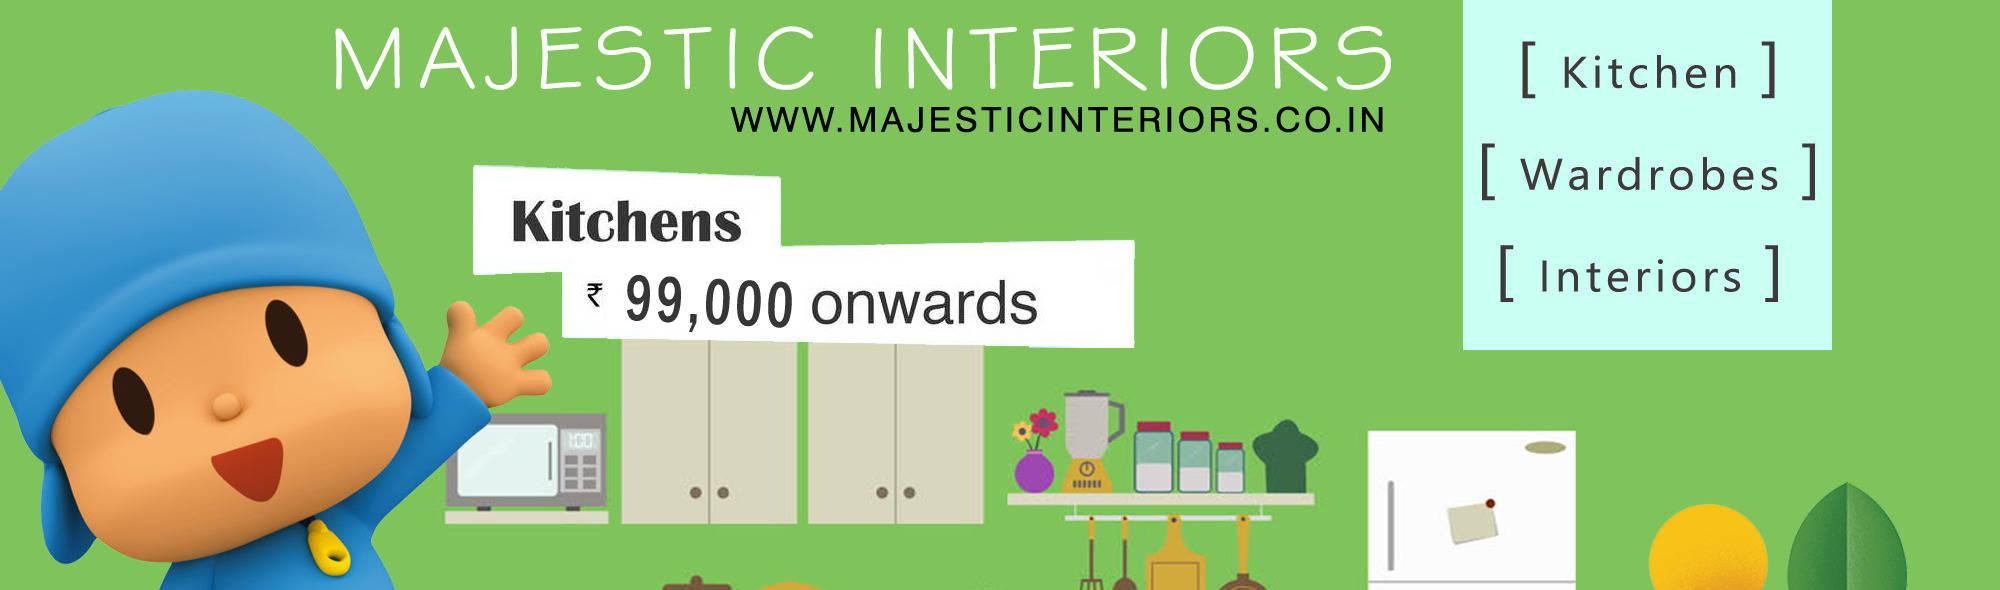 MAJESTIC INTERIORS